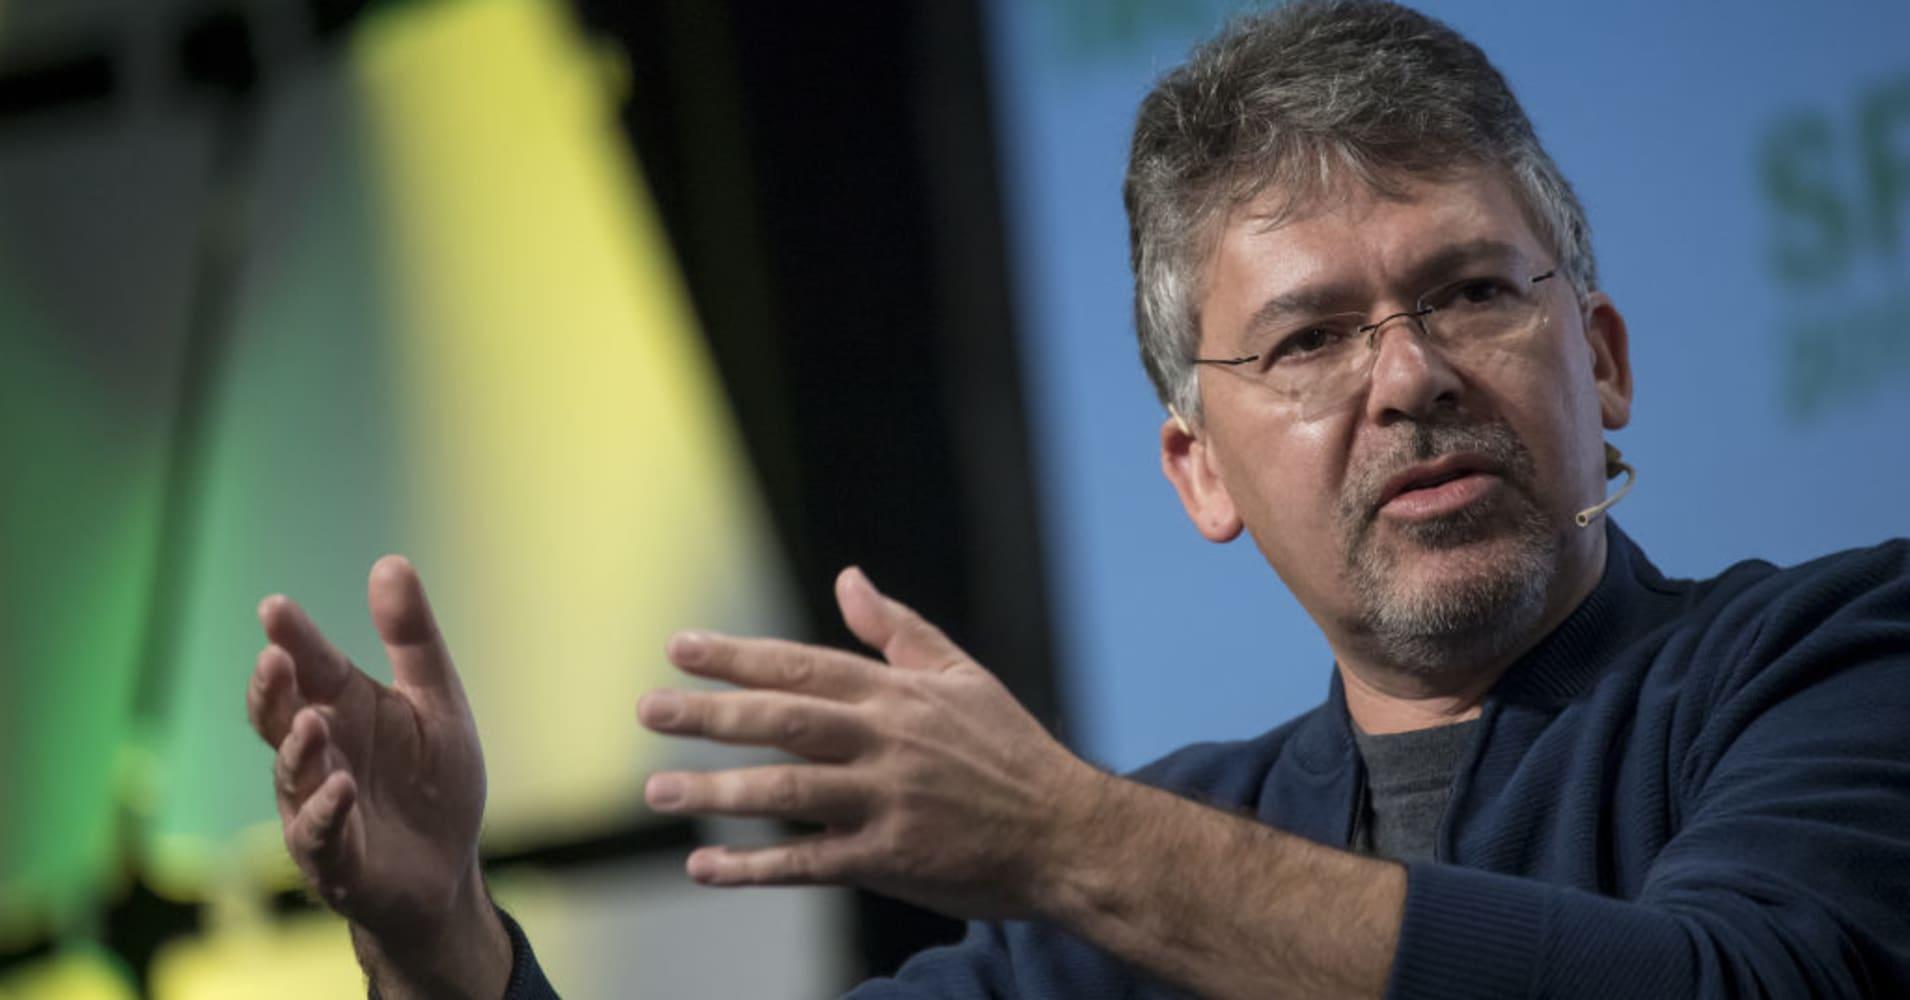 John Giannandrea, senior vice president of engineering at Google